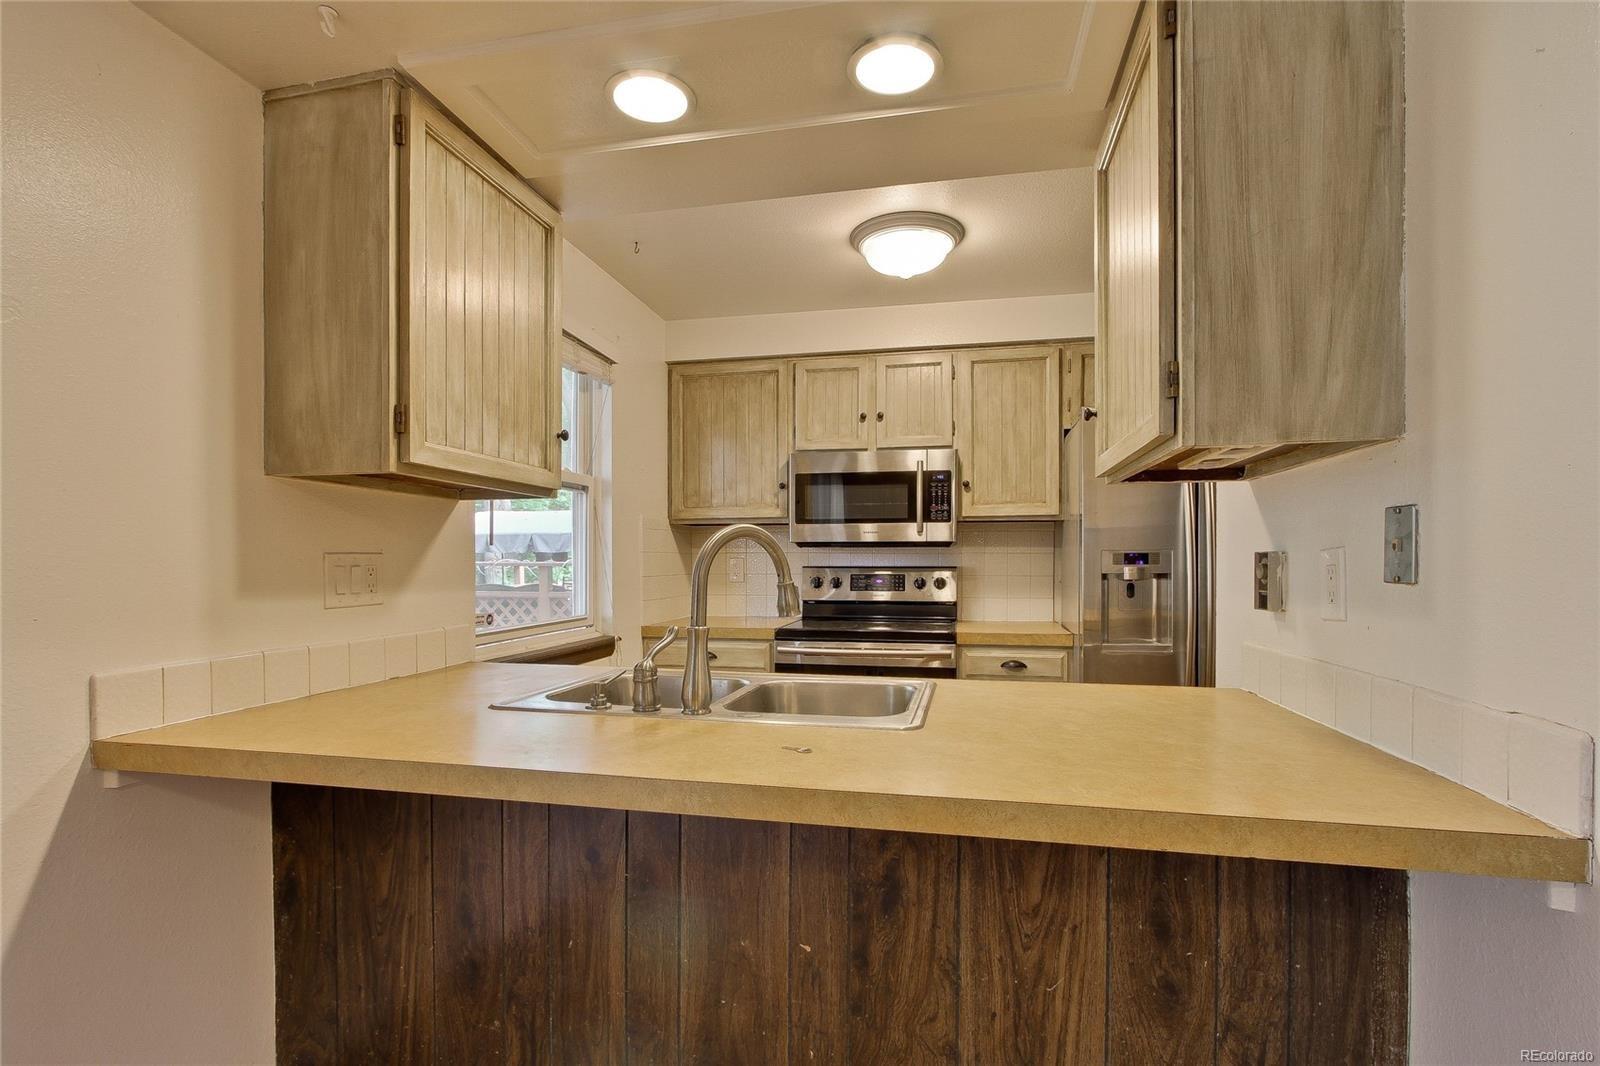 MLS# 6212280 - 1320  Dogwood Lane, Longmont, CO 80501